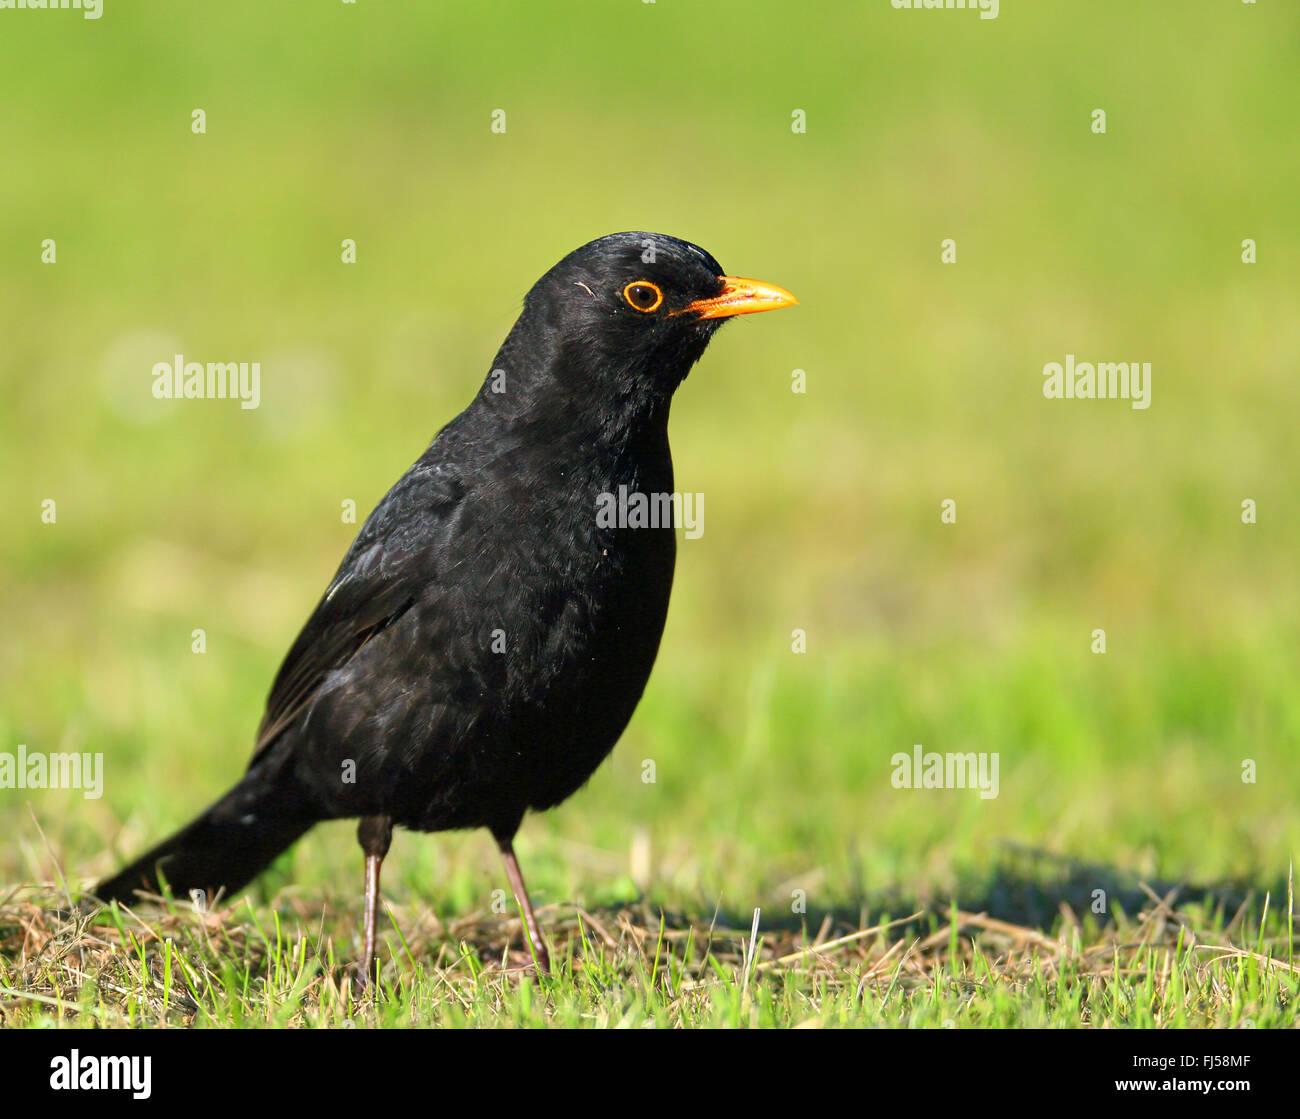 blackbird (Turdus merula), male stands on grass, Netherlands, Frisia - Stock Image